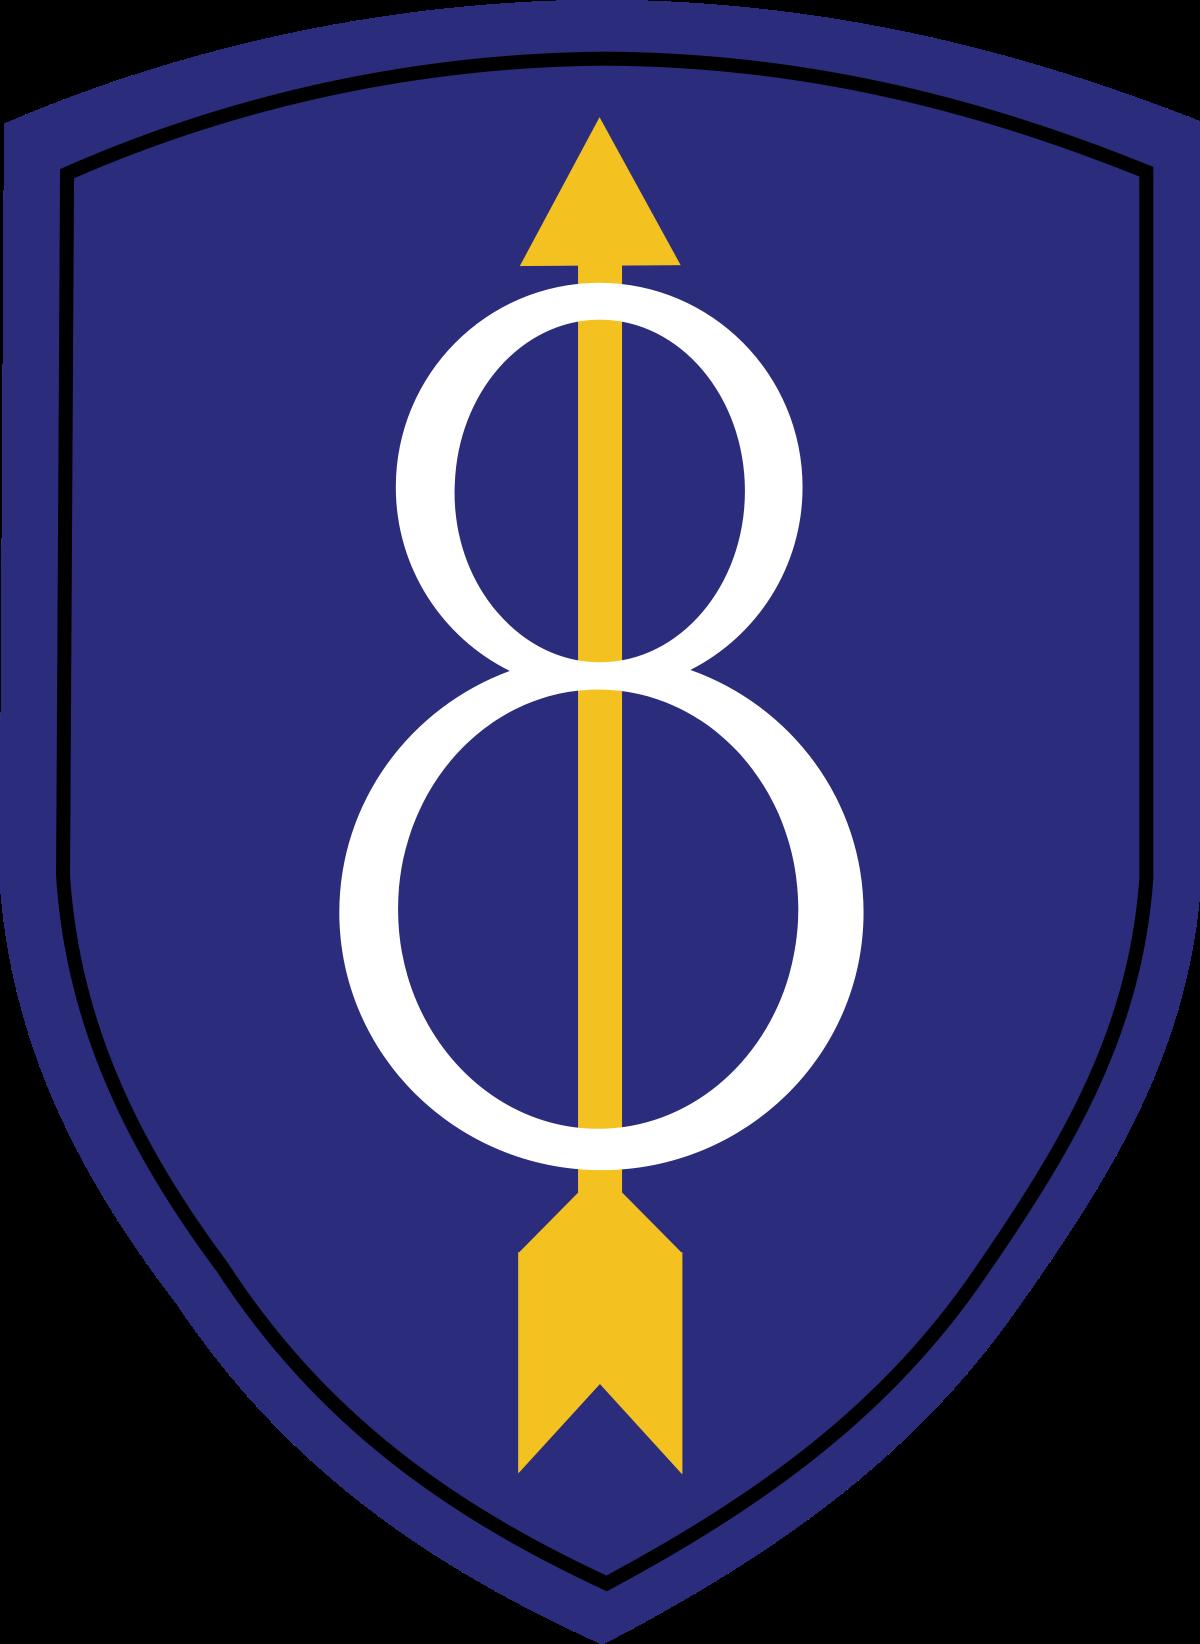 Us symbols choice image. Navy clipart bonus army